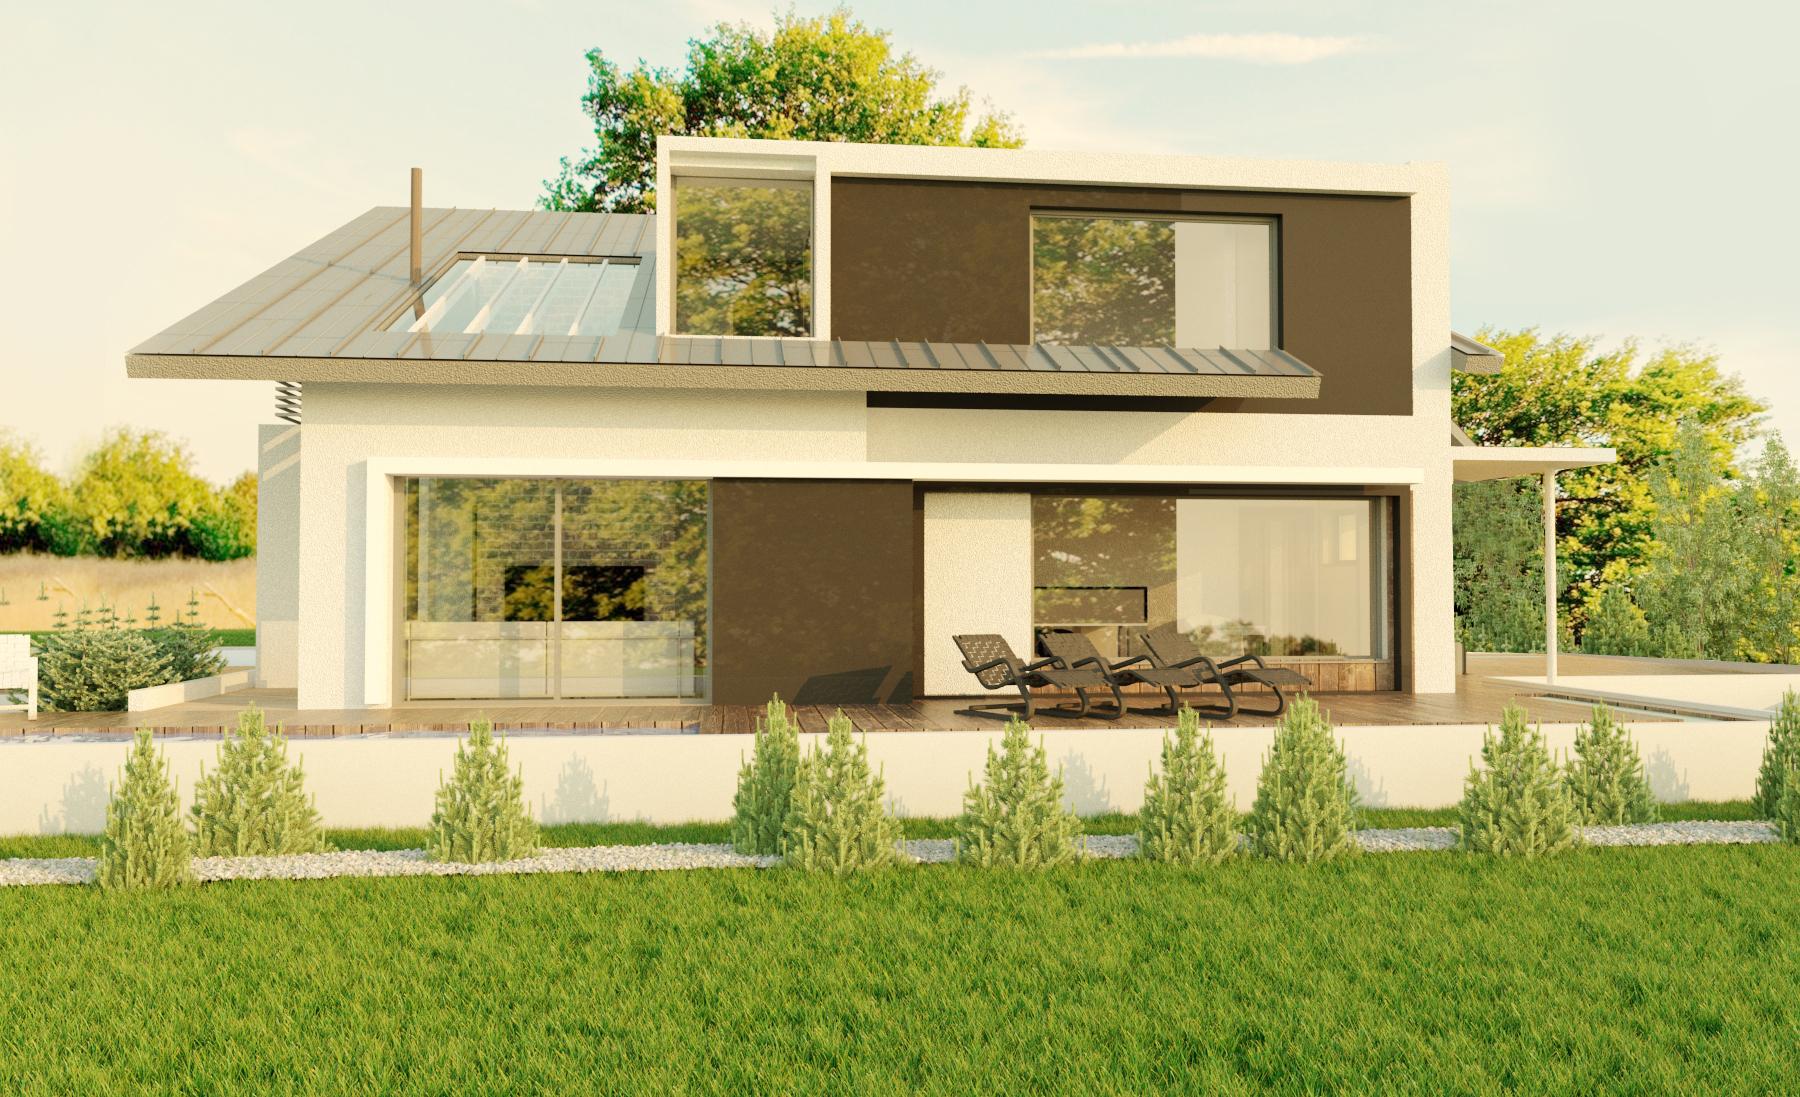 Проект мансардного дома, блочного с террасой DZ